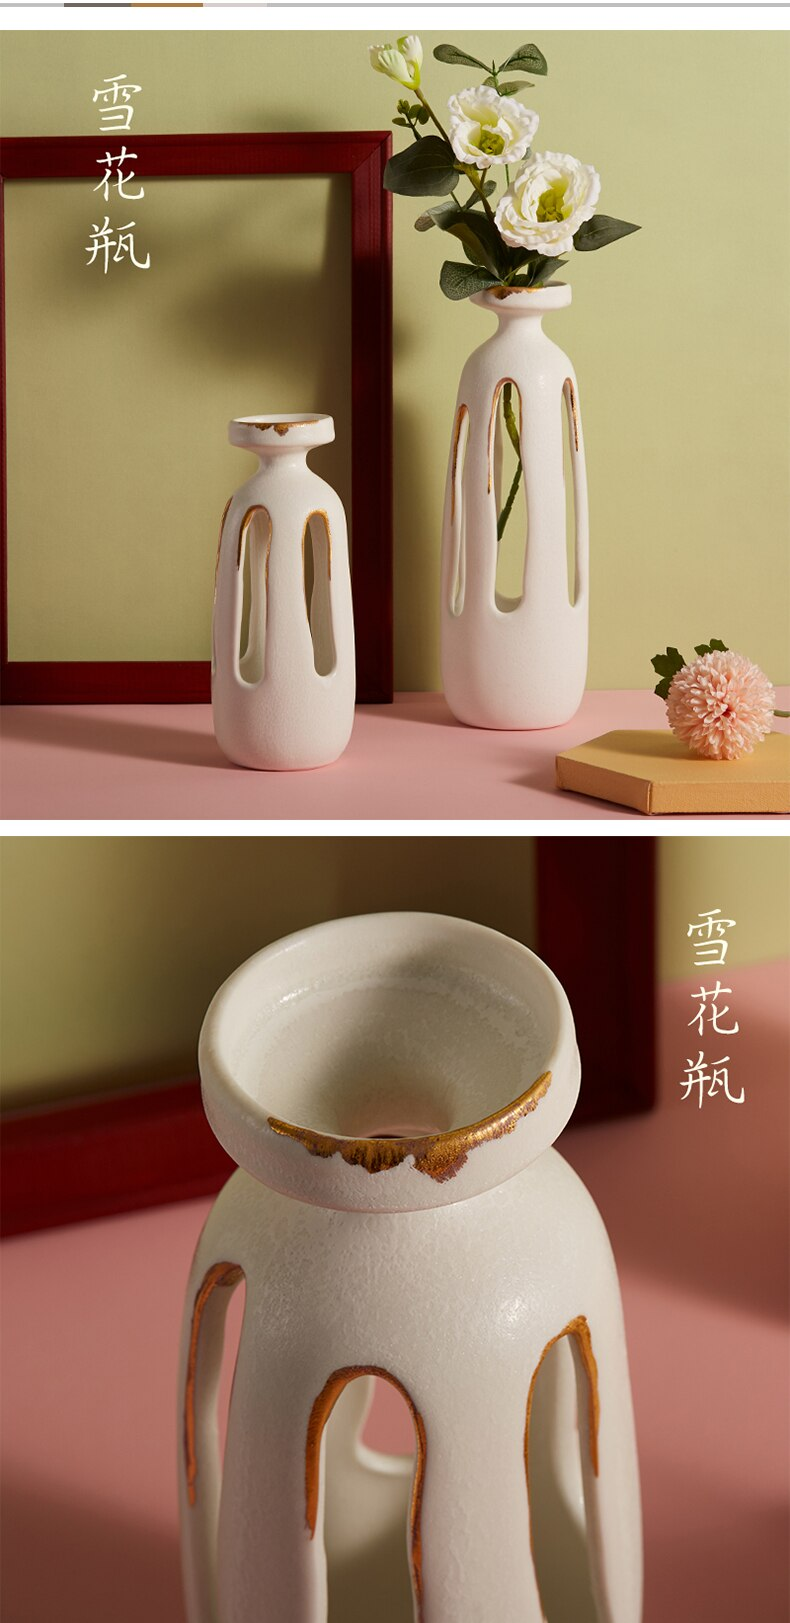 Creative Nordic ceramics vase design Flower arrangement Golden flower vase Modern decoration Home living room accessories